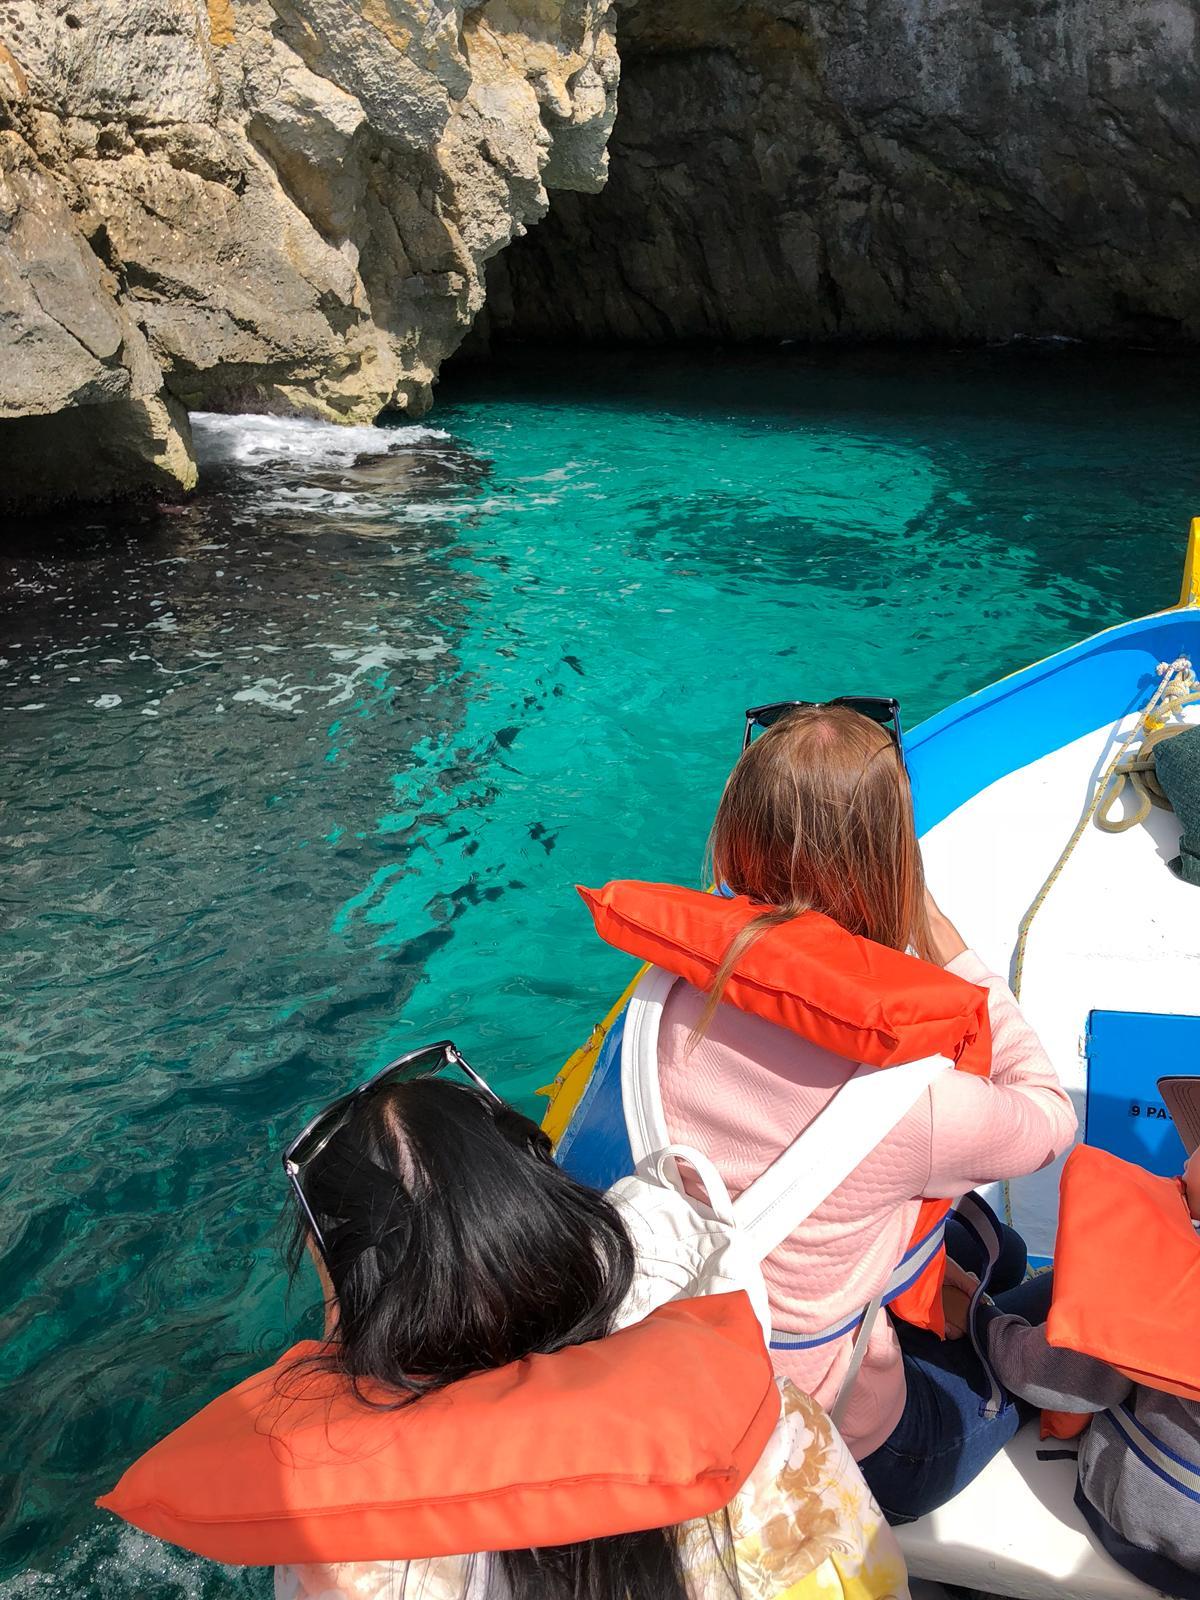 Blue Grotto Tours